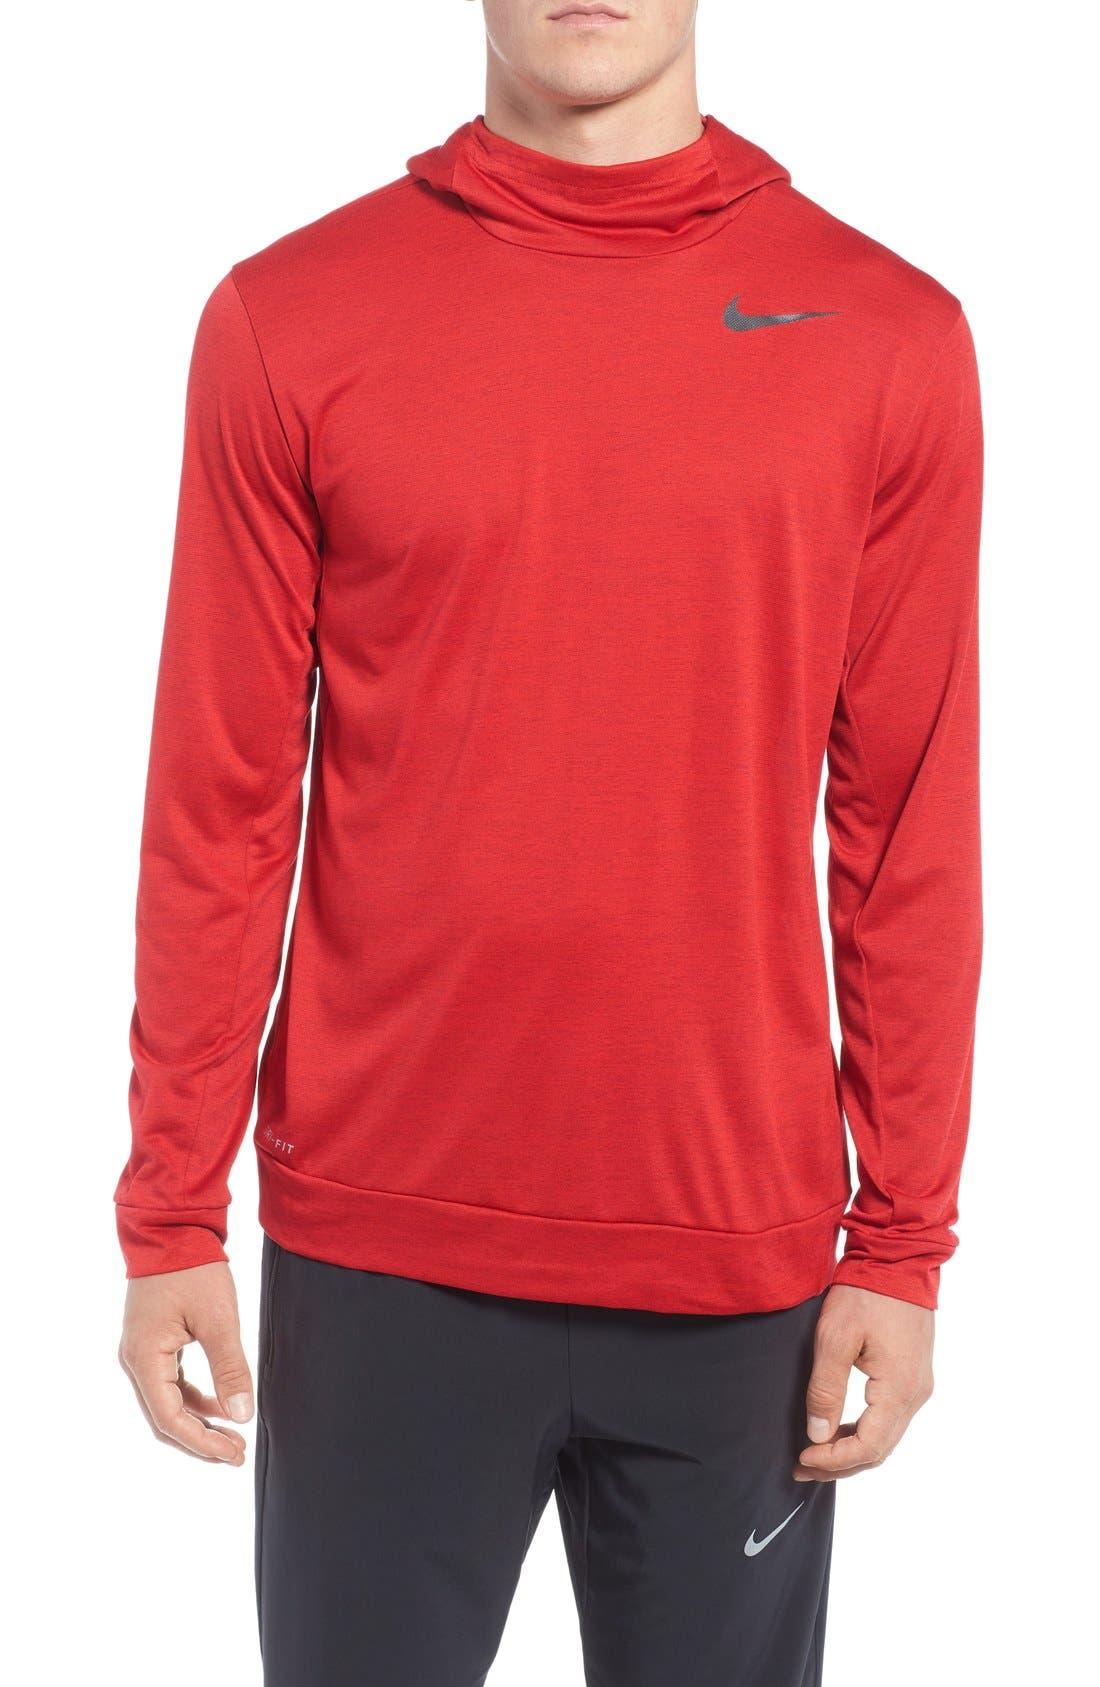 Alternate Image 1 Selected - Nike Dri-FIT Training Hoodie